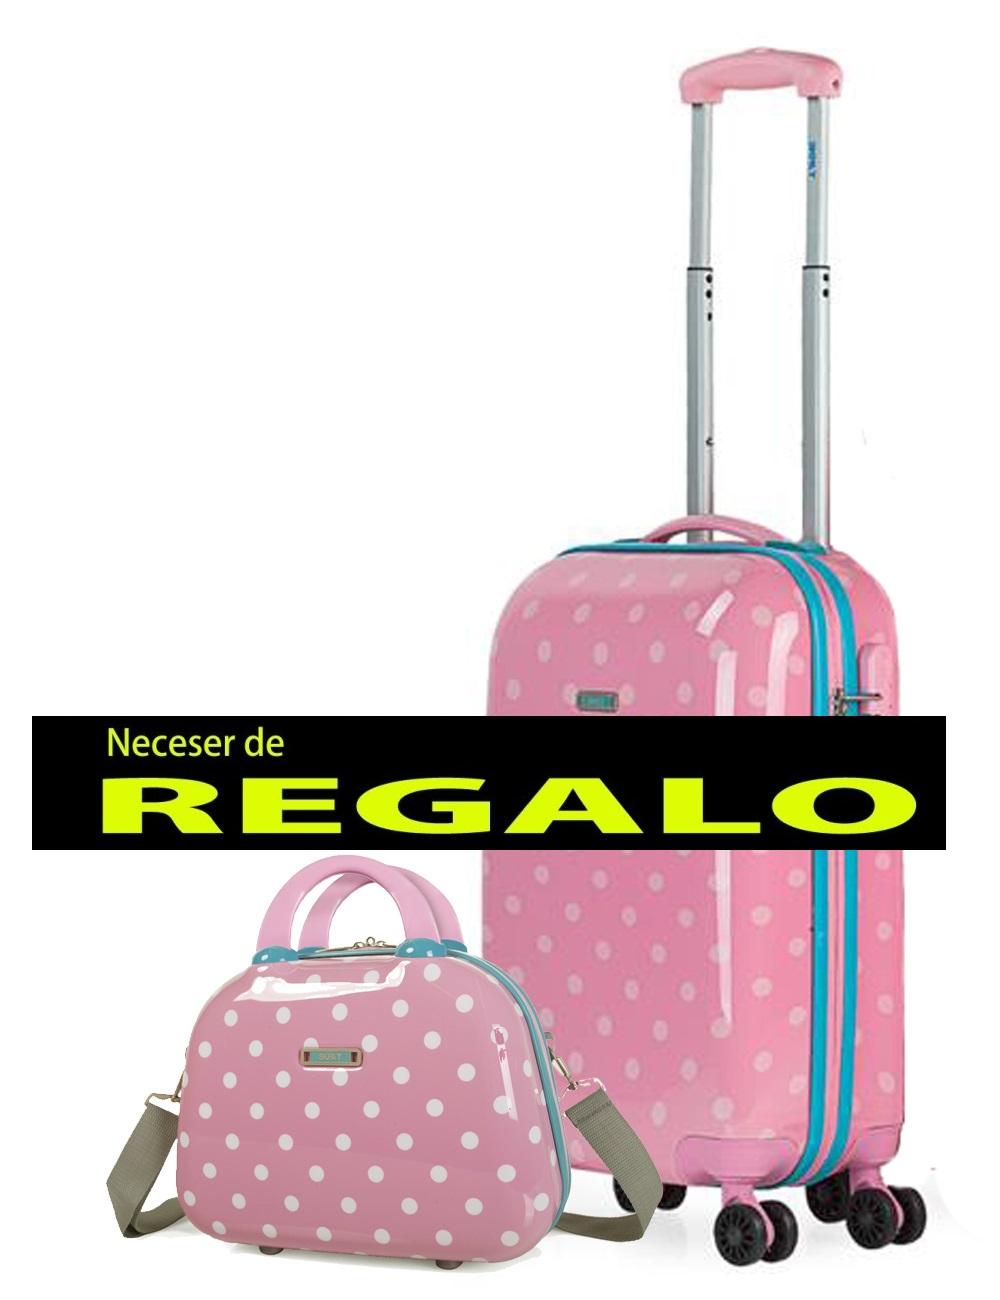 66450B-02 Maleta Cabina y Neceser Skpat Topos Rosa